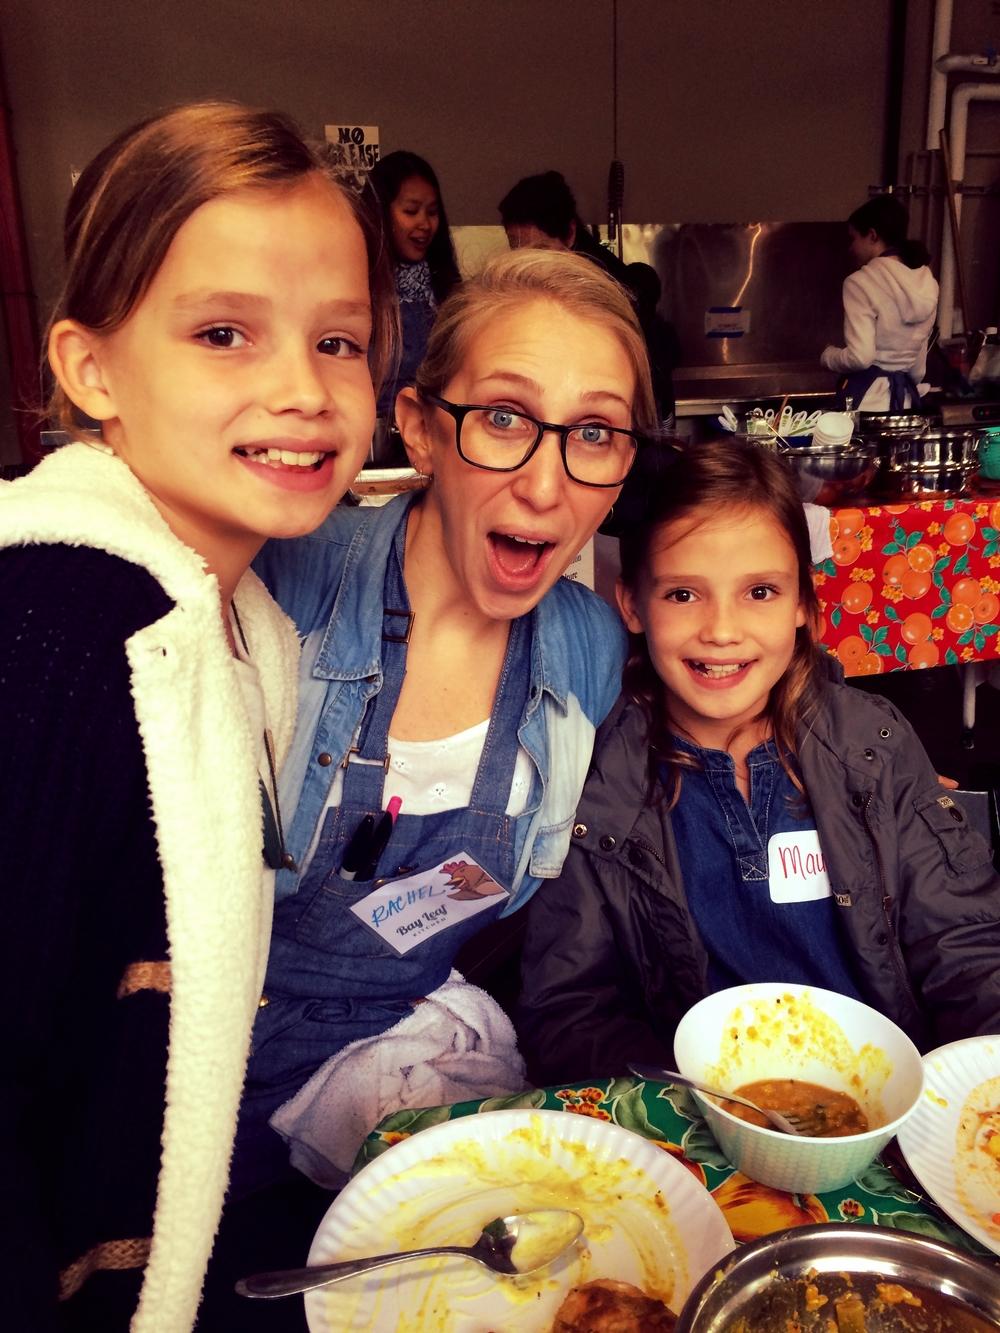 Rachel & Twins S1D3 2015.jpg